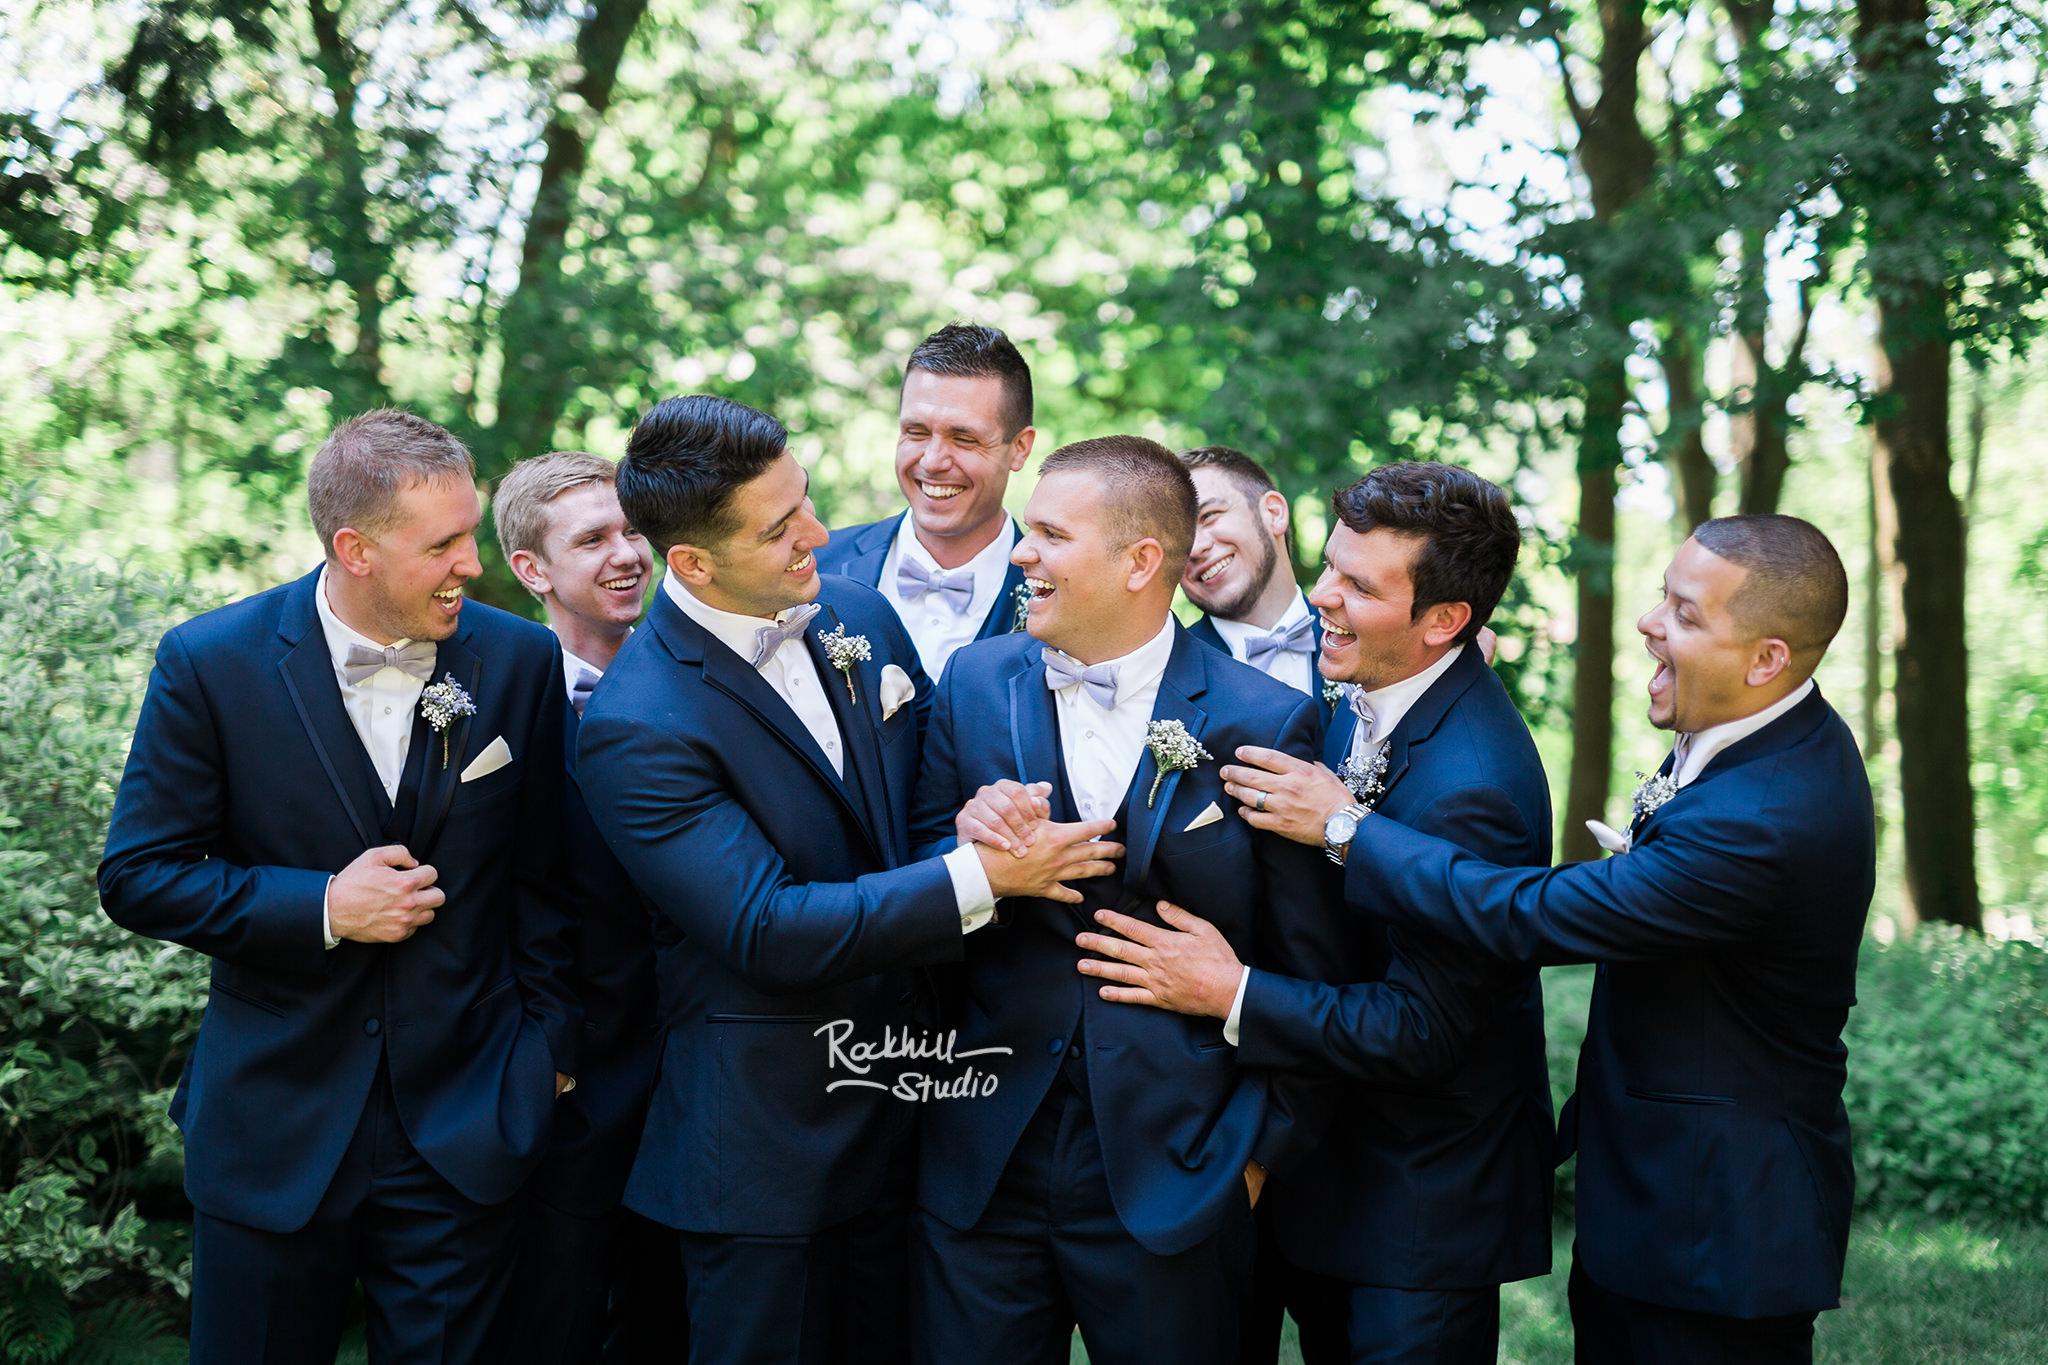 Traverse-City-wedding-photography-rockhill-studio-michigan-gk-gr-2.jpg